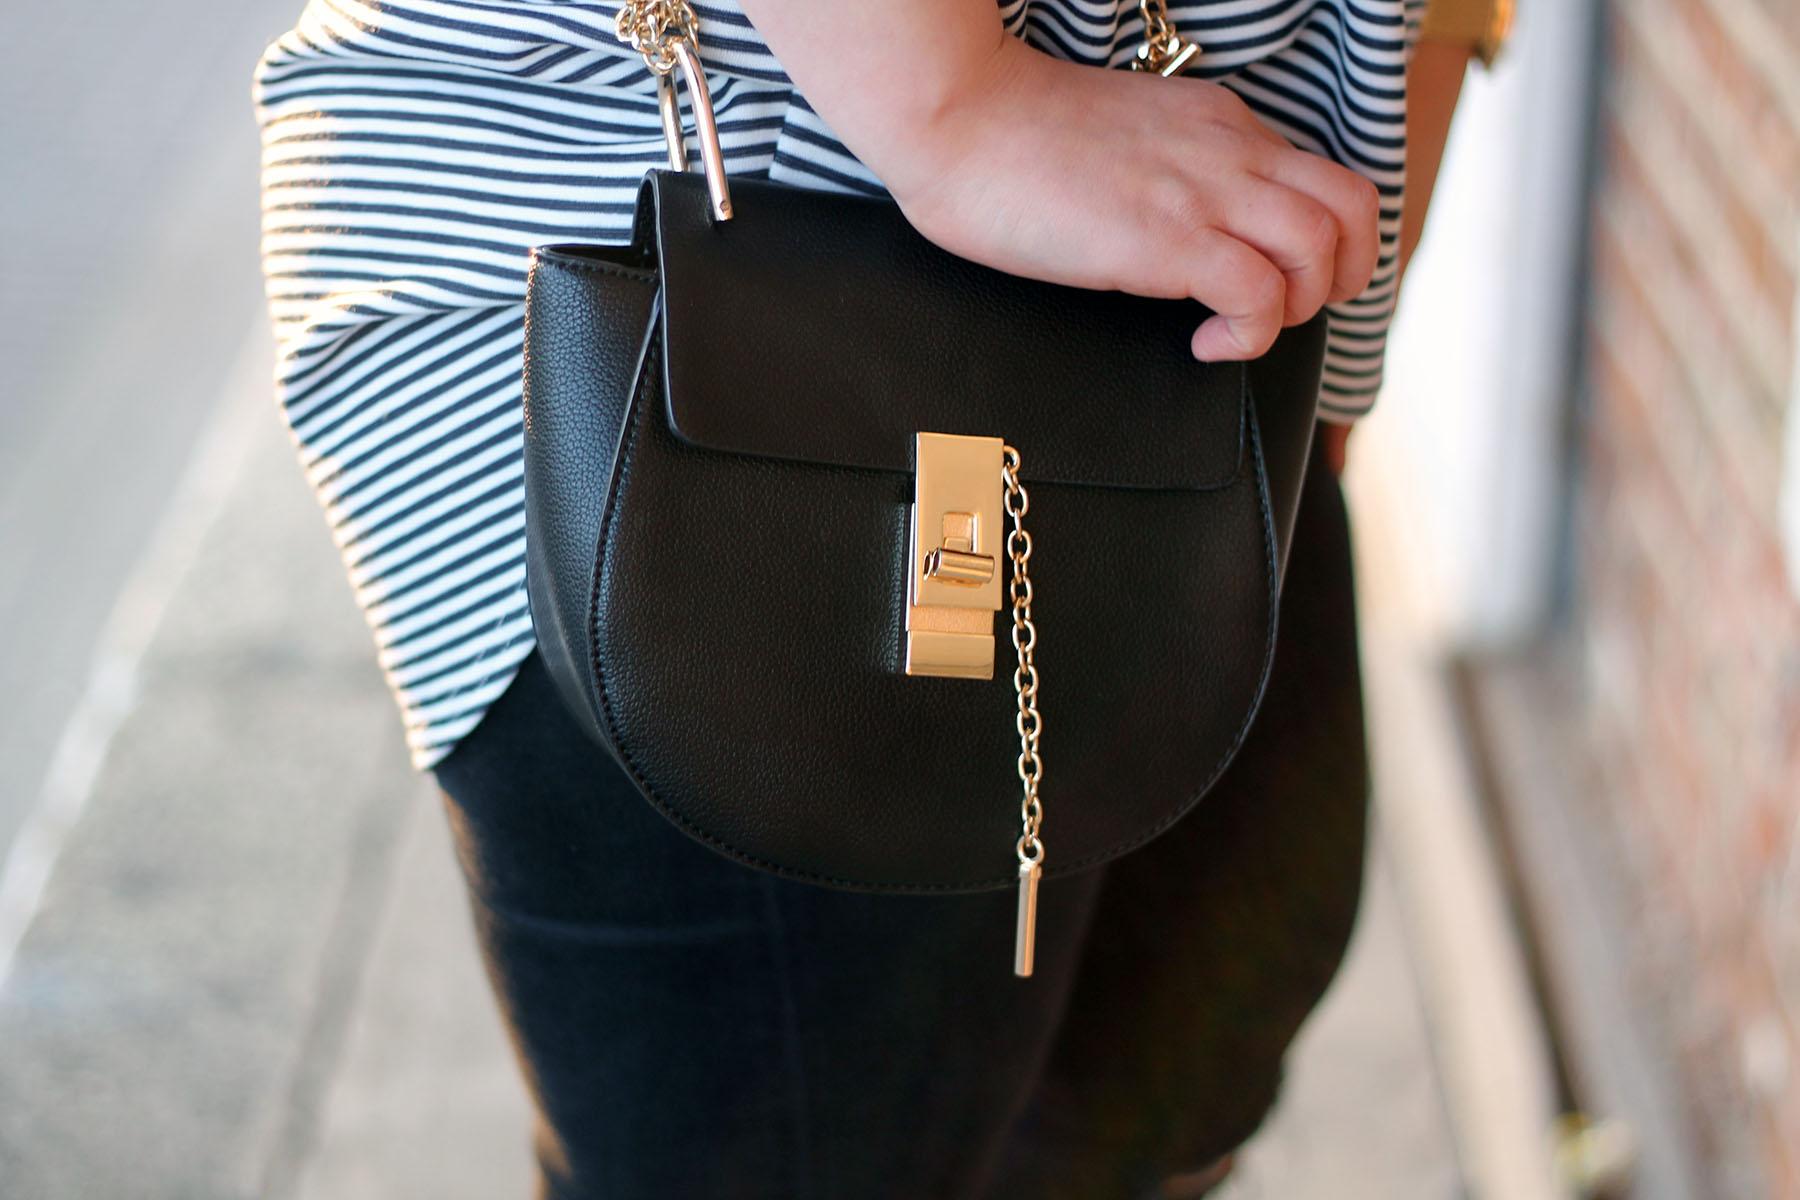 fashionblog-modeblog-tasche-chloe-drew-lookalike